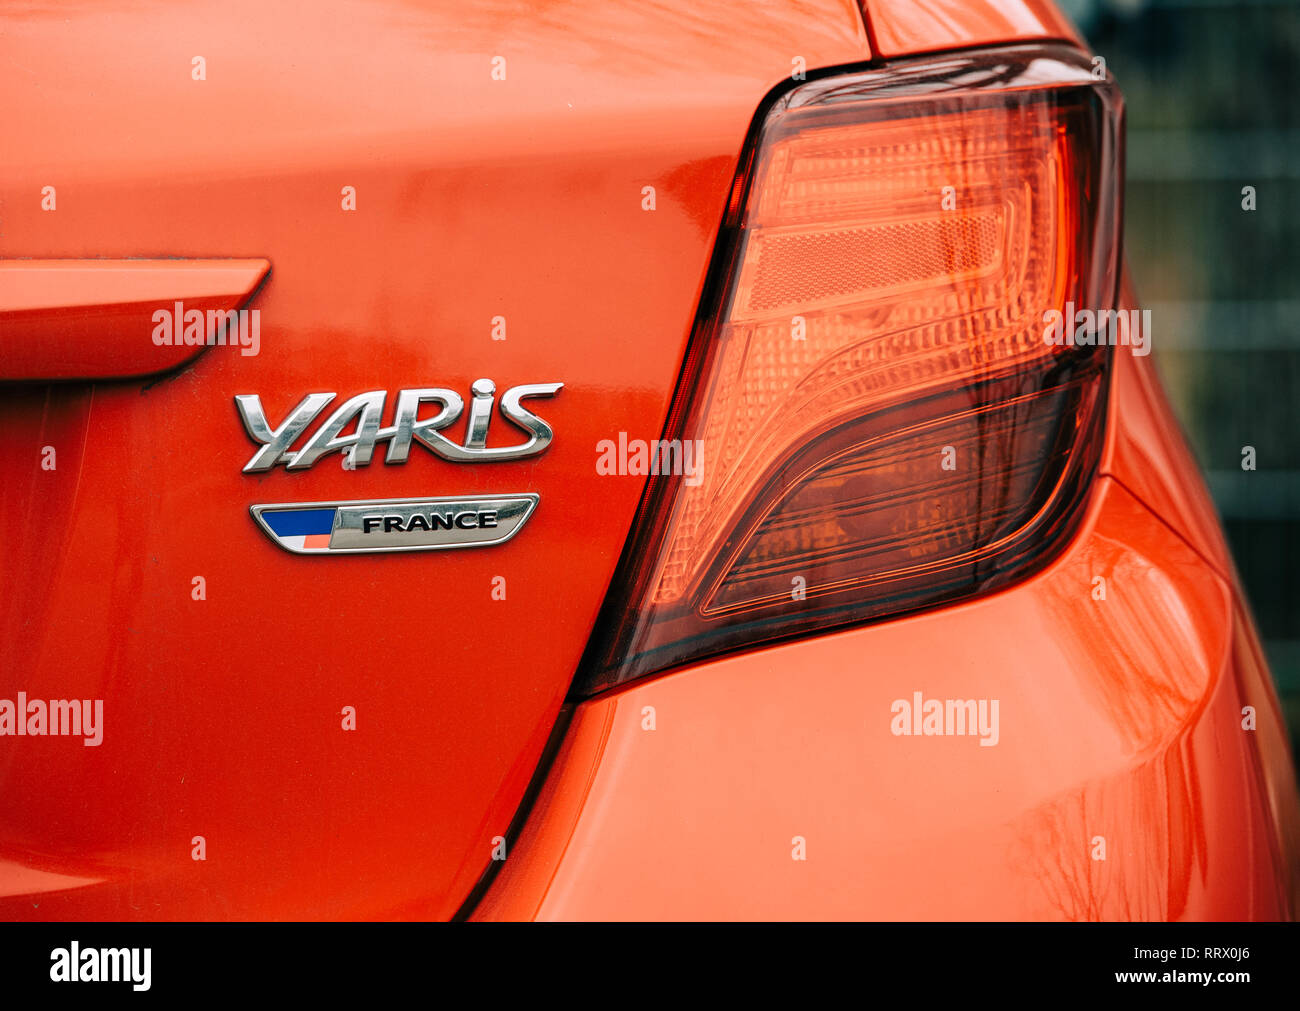 hight resolution of strasbourg france dec 14 2018 reav view of red toyota yaris car